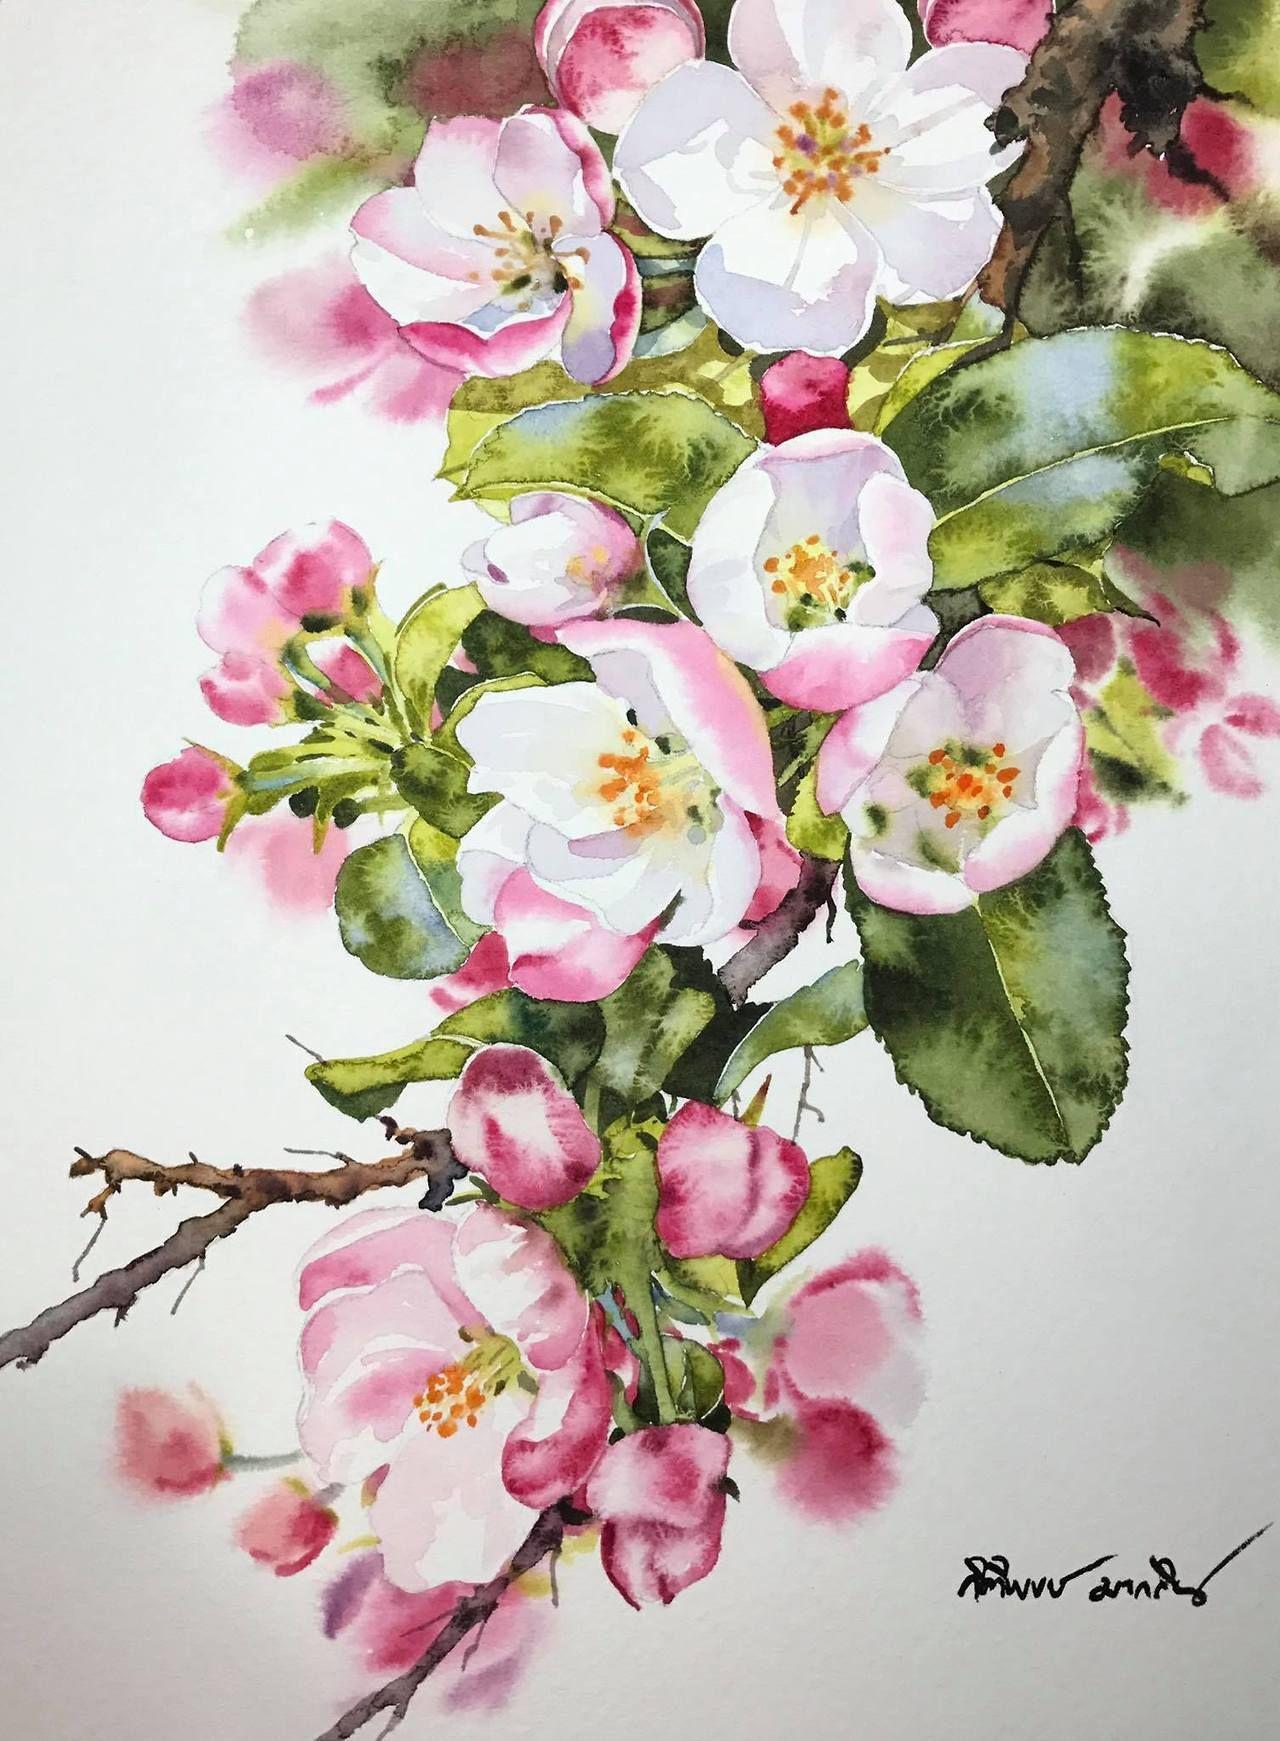 Tu Recepcja Watercolors By Kitipong Maksin An Artist From